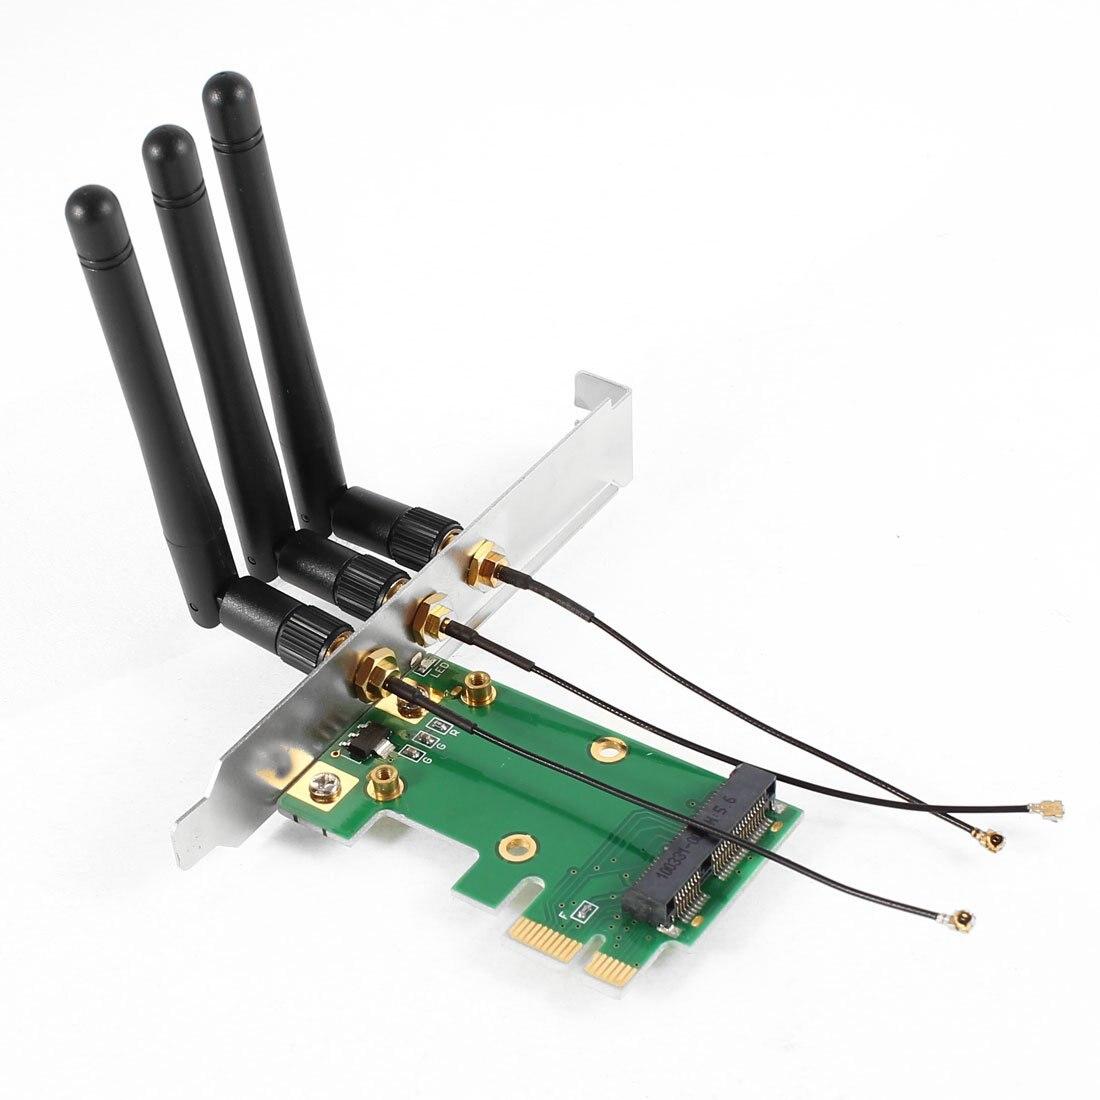 CAA Hot Mini PCI-E Express to PCI-E Wireless Adapter w 3 Antenna WiFi for PC